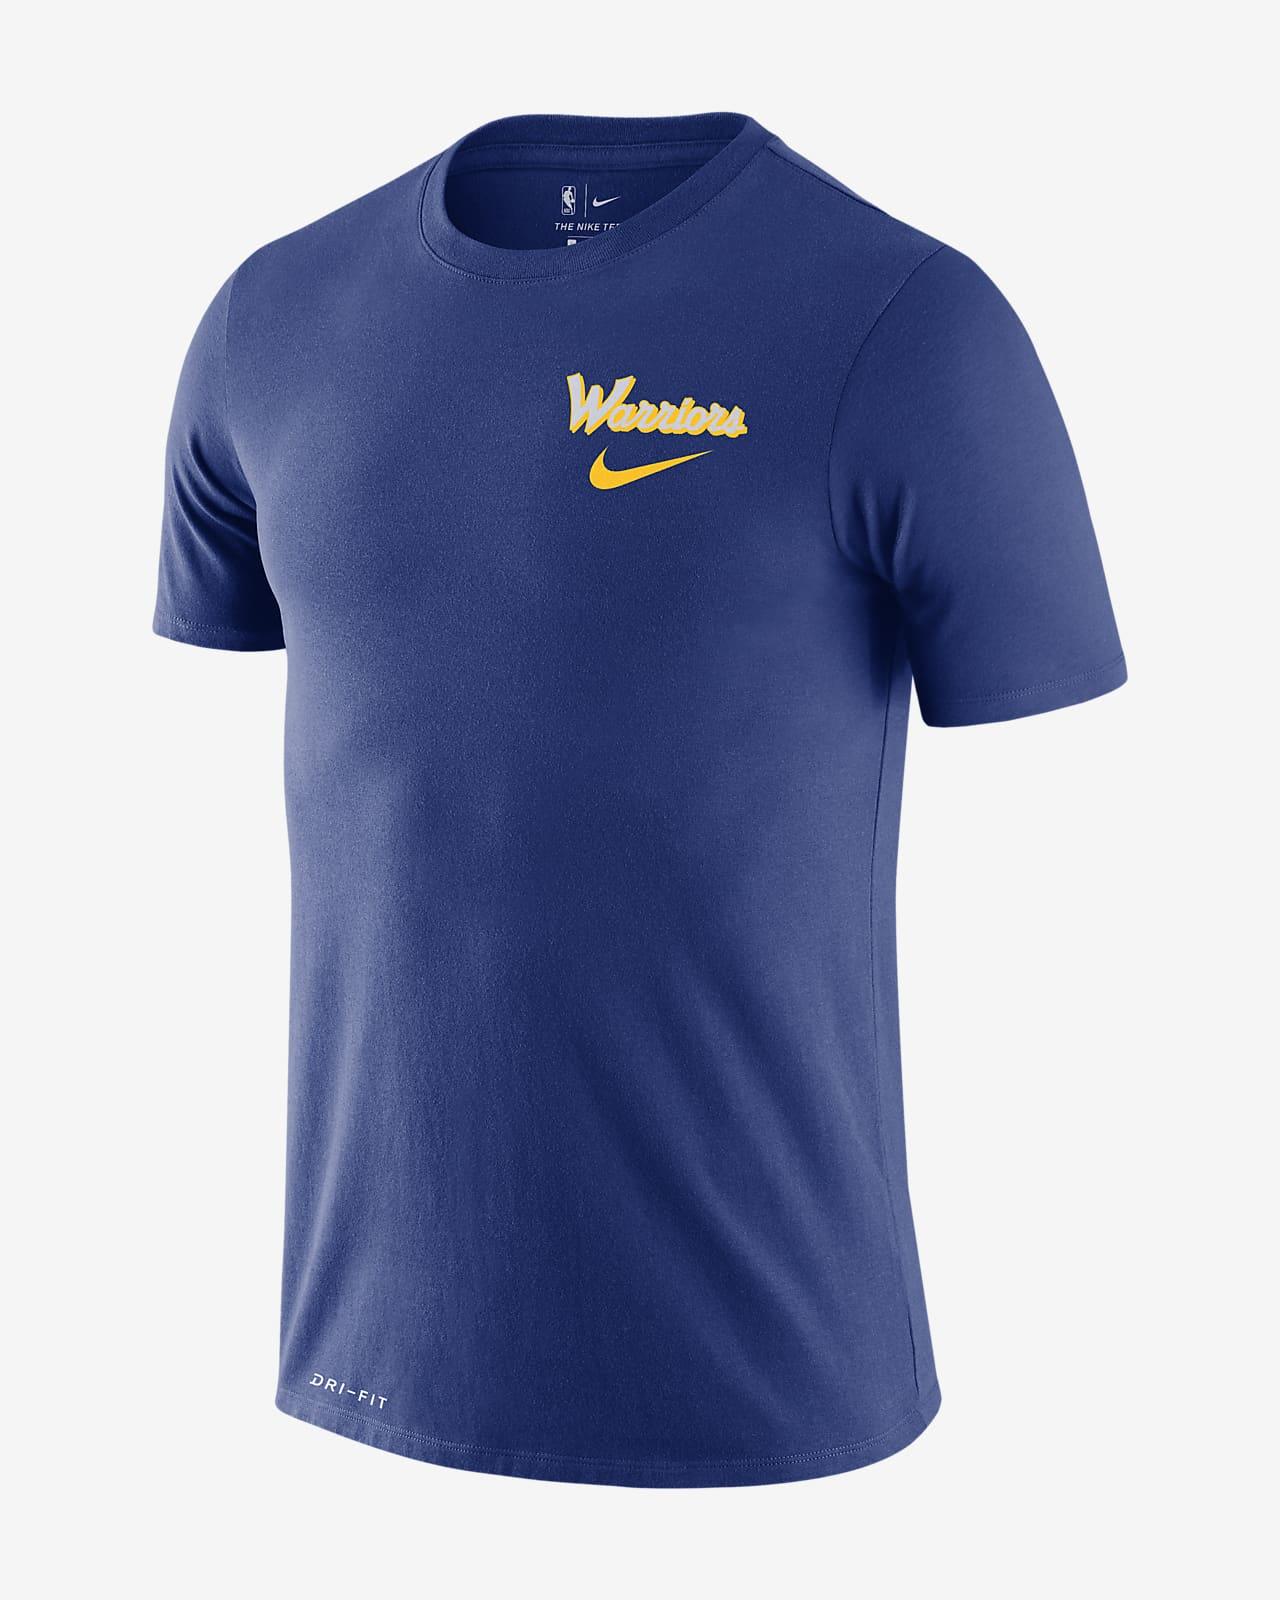 Warriors Wavy Wordmark Men's Nike Dri-FIT NBA T-Shirt